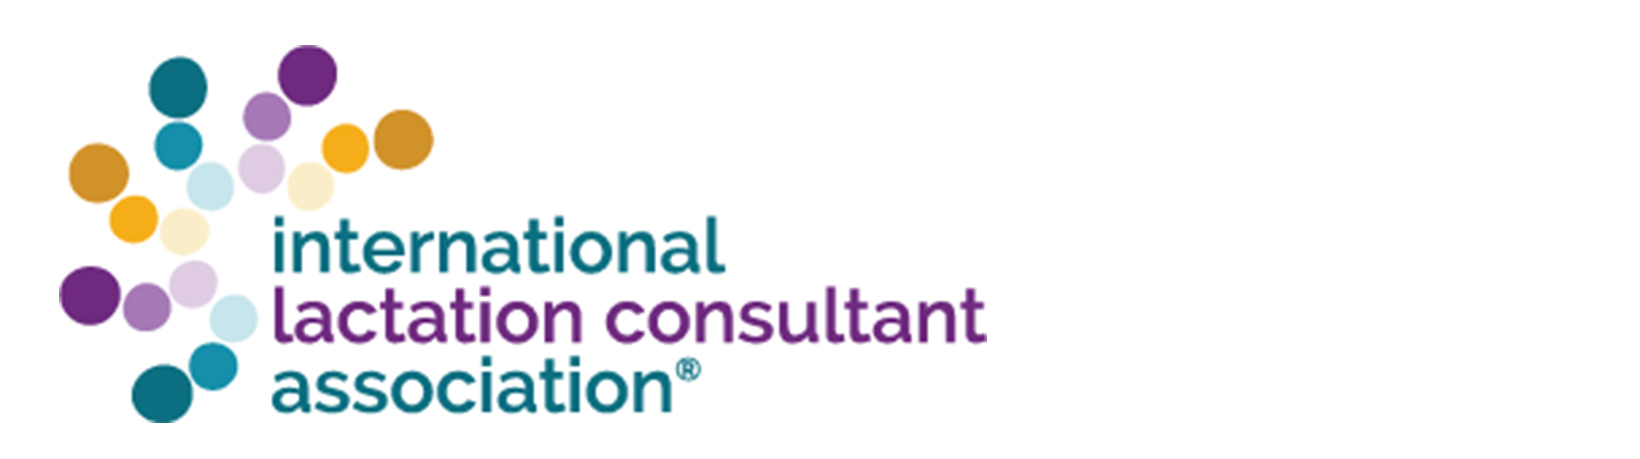 International Lactation Consultant Association